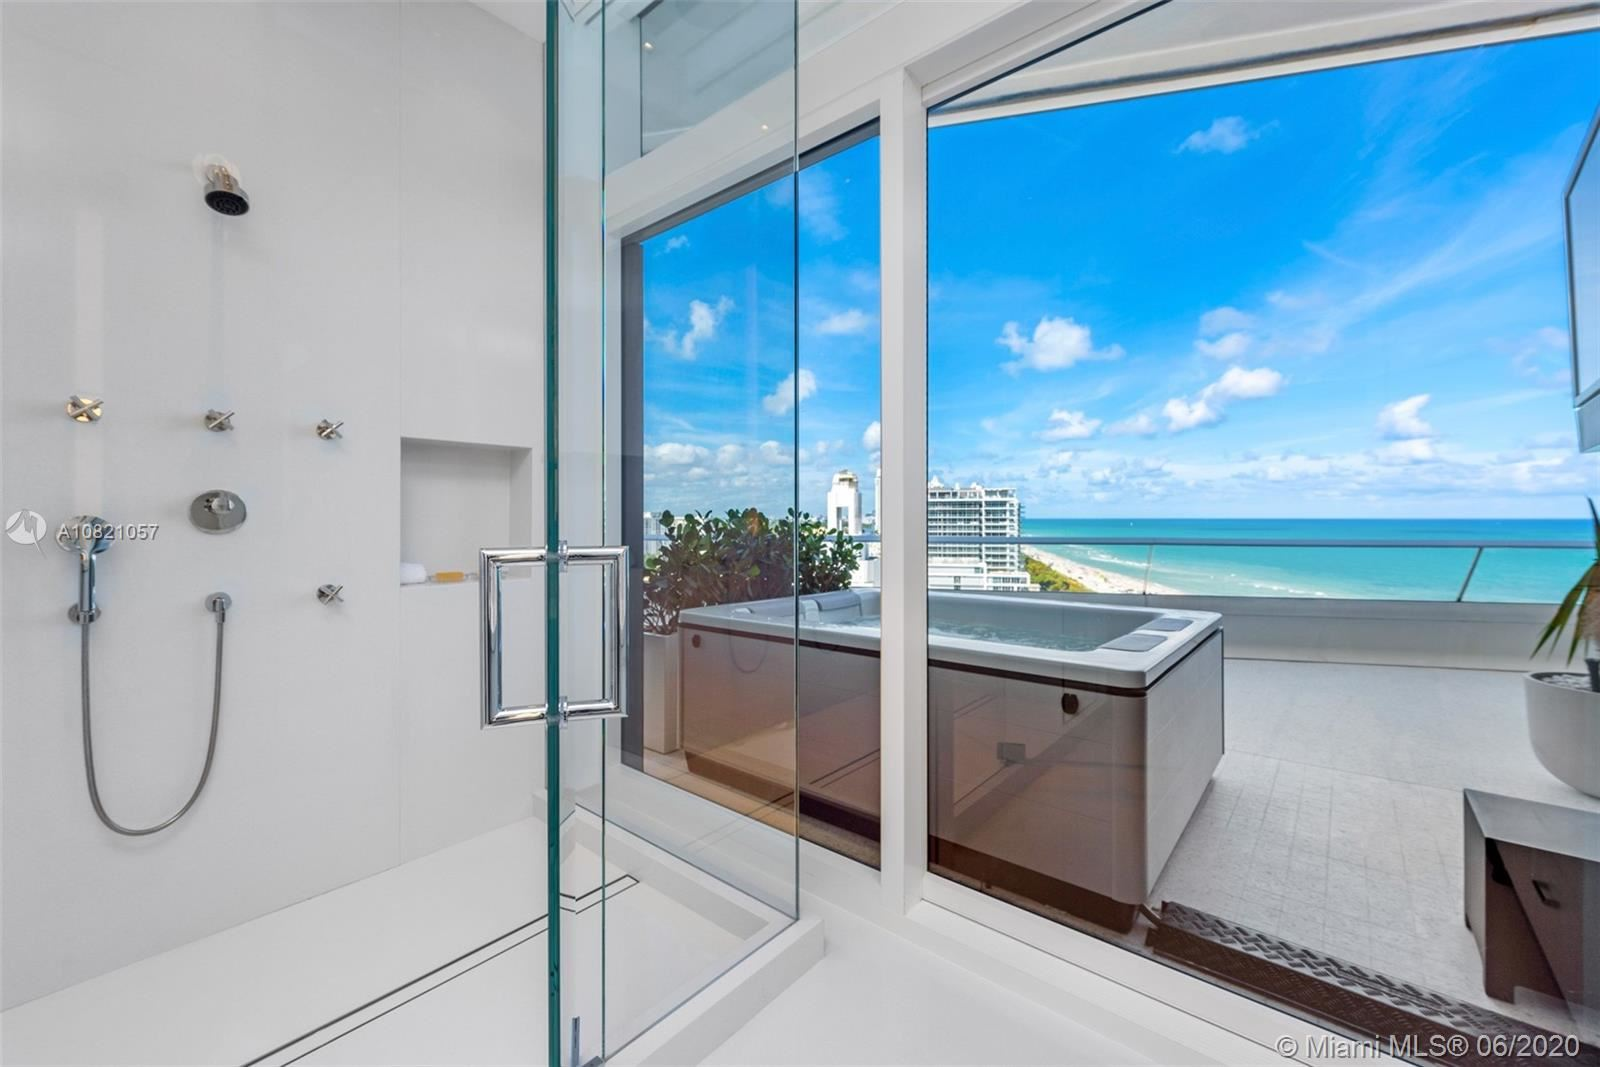 Photo 13 of Listing MLS a10821057 in 3315 Collins Ave #PH-B Miami Beach FL 33140